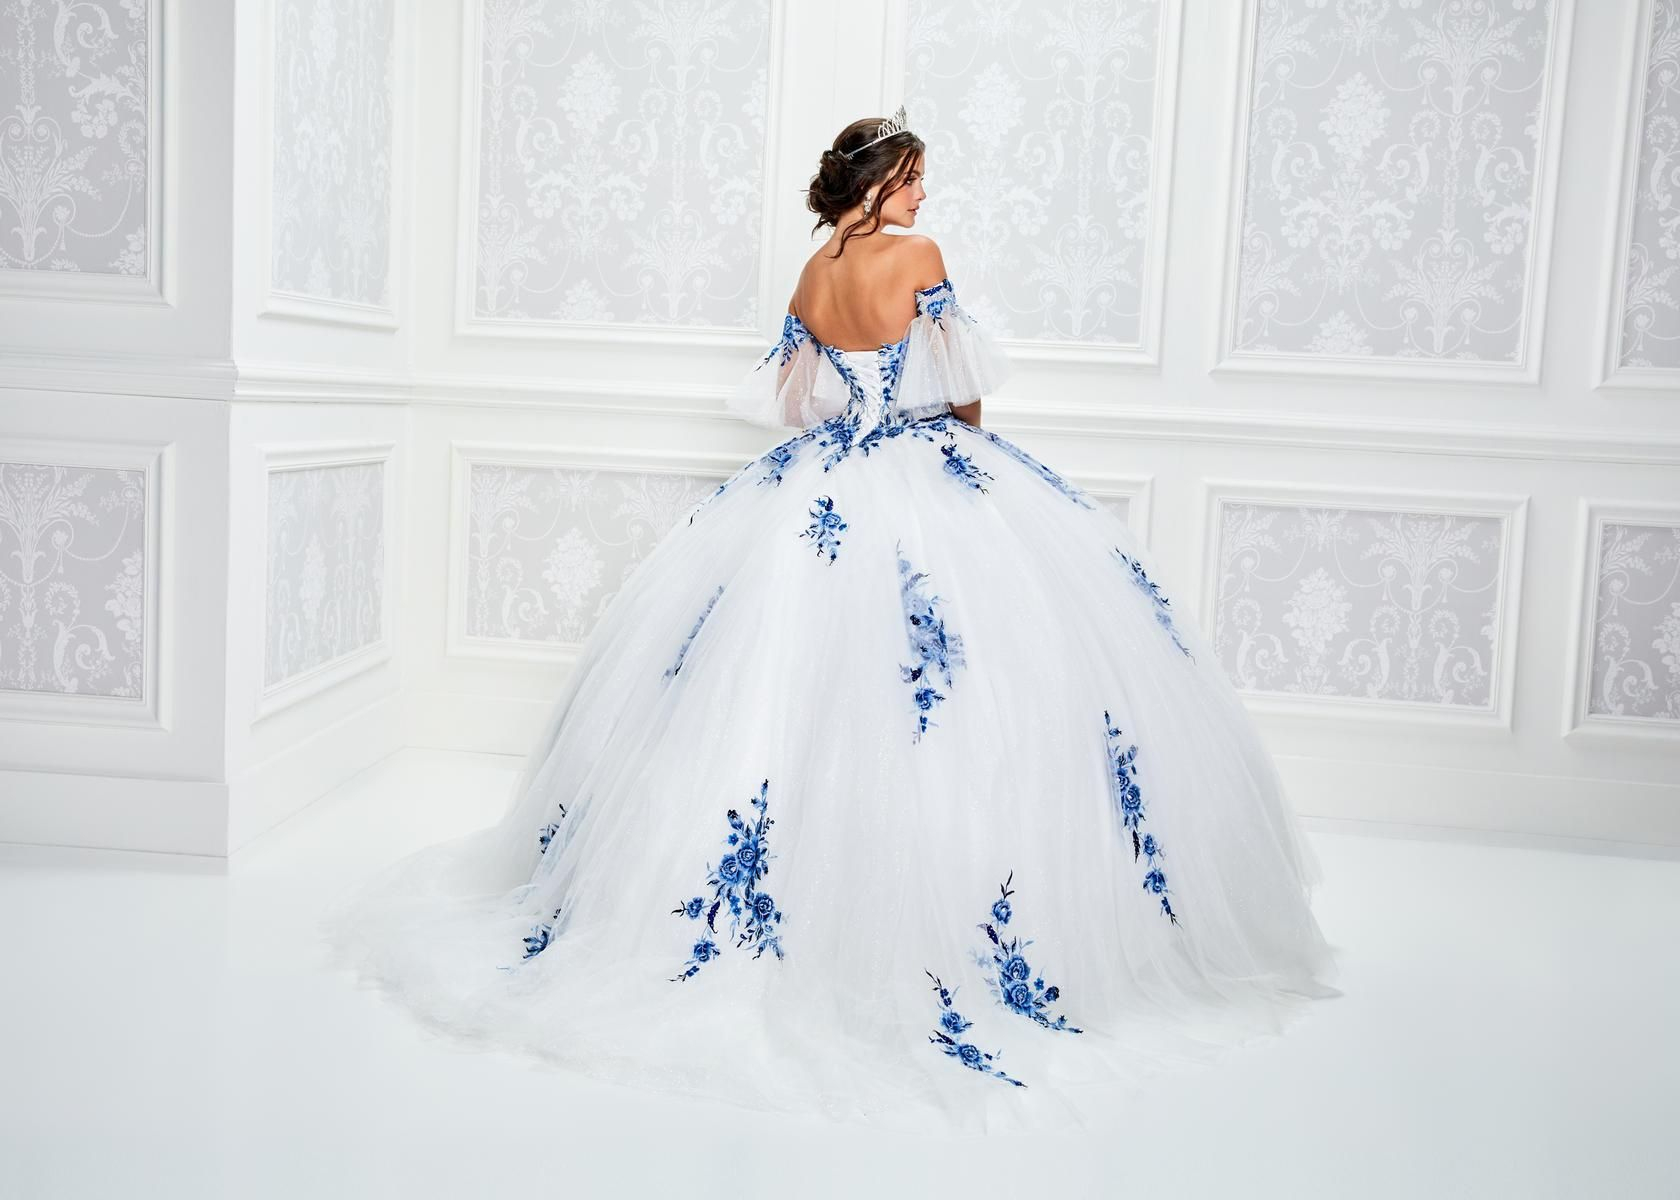 Quinceanera Dress Pr11928 Princesa In 2021 Dresses Quinceanera Dresses Sweet 15 Dresses [ 1200 x 1680 Pixel ]